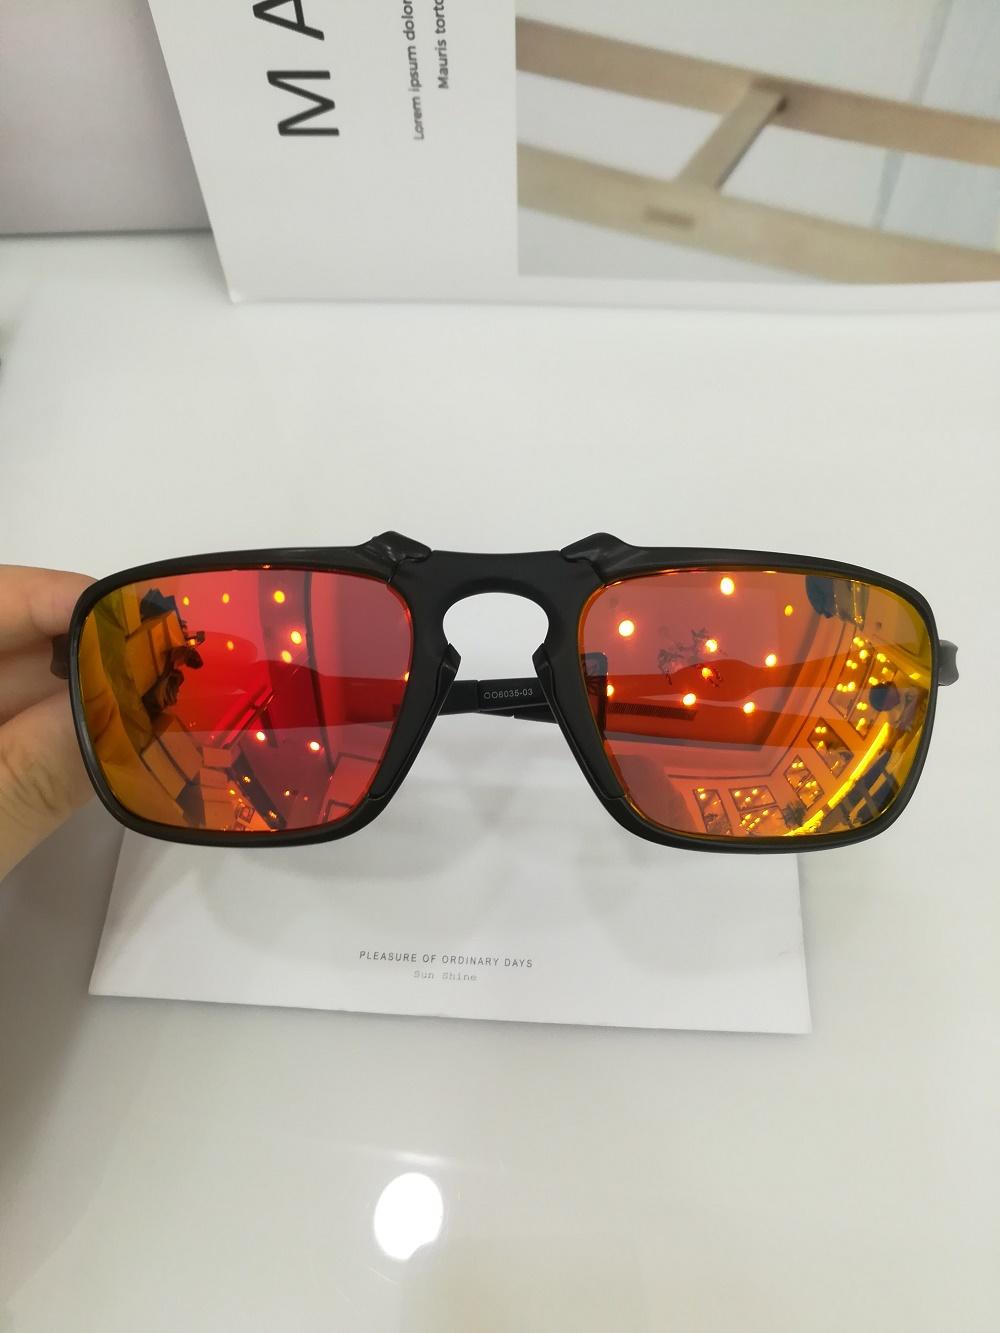 Sunglass Glasses